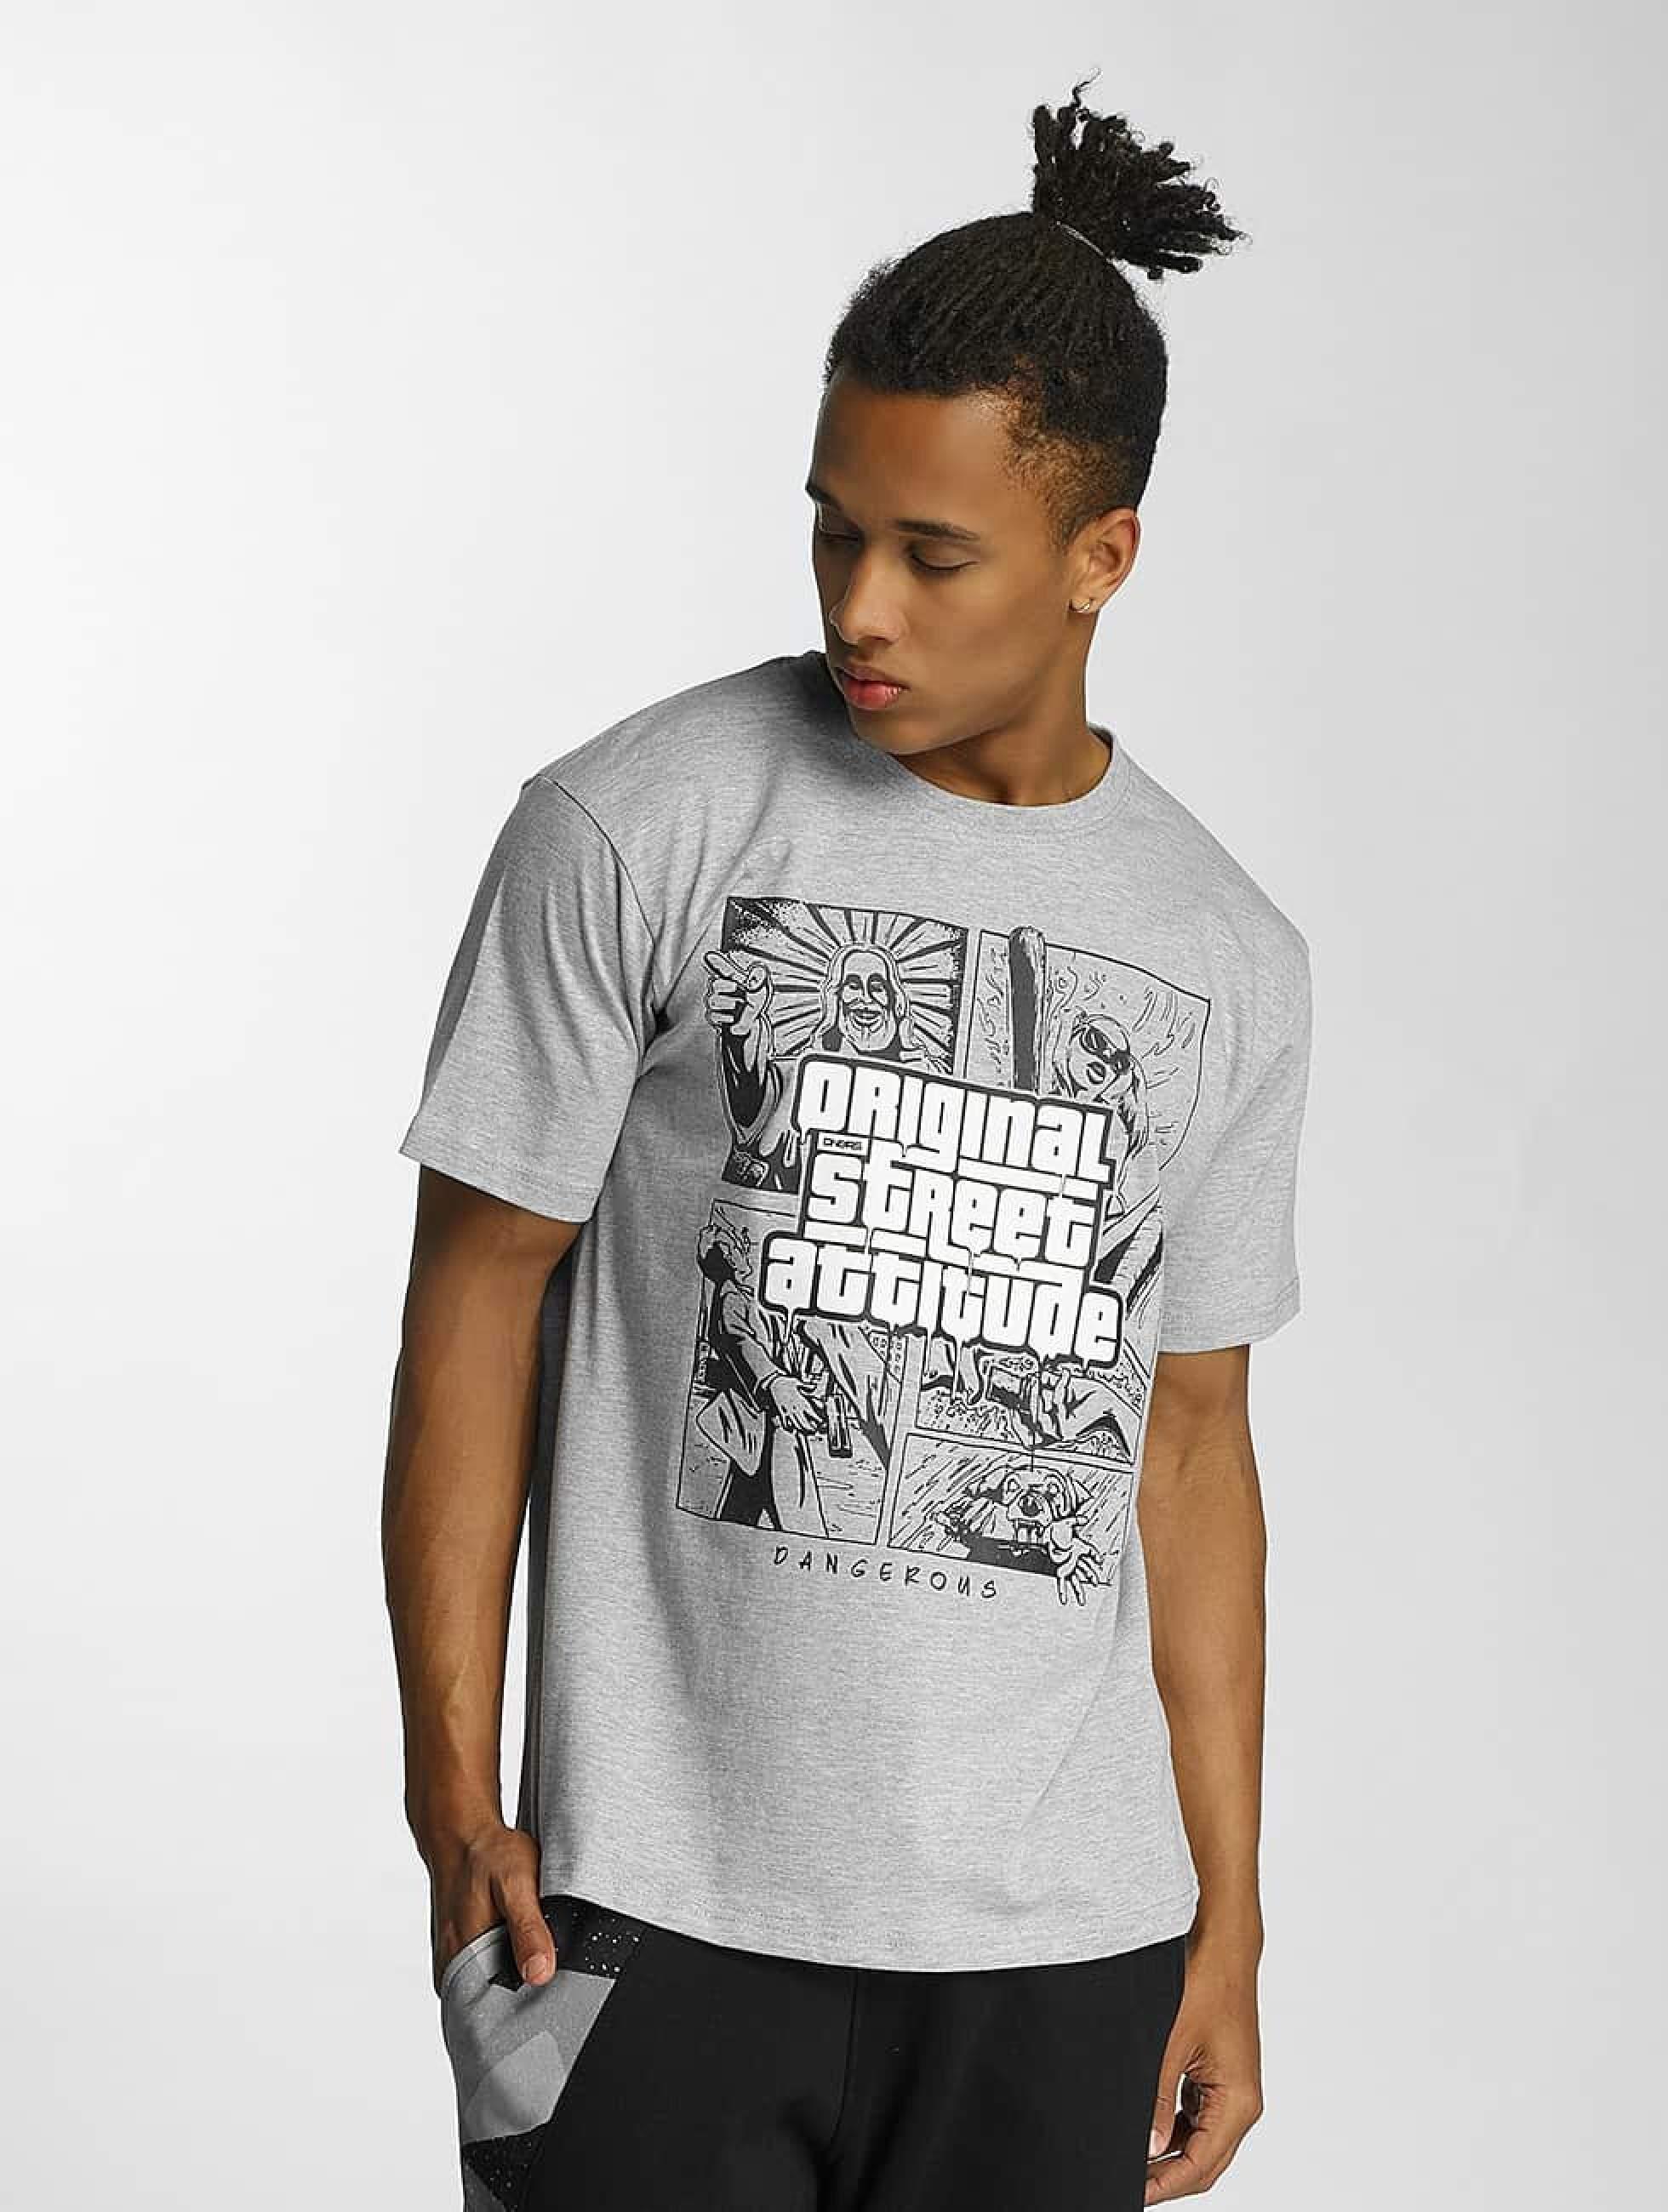 Dangerous DNGRS / T-Shirt Original Street Attiude in grey M